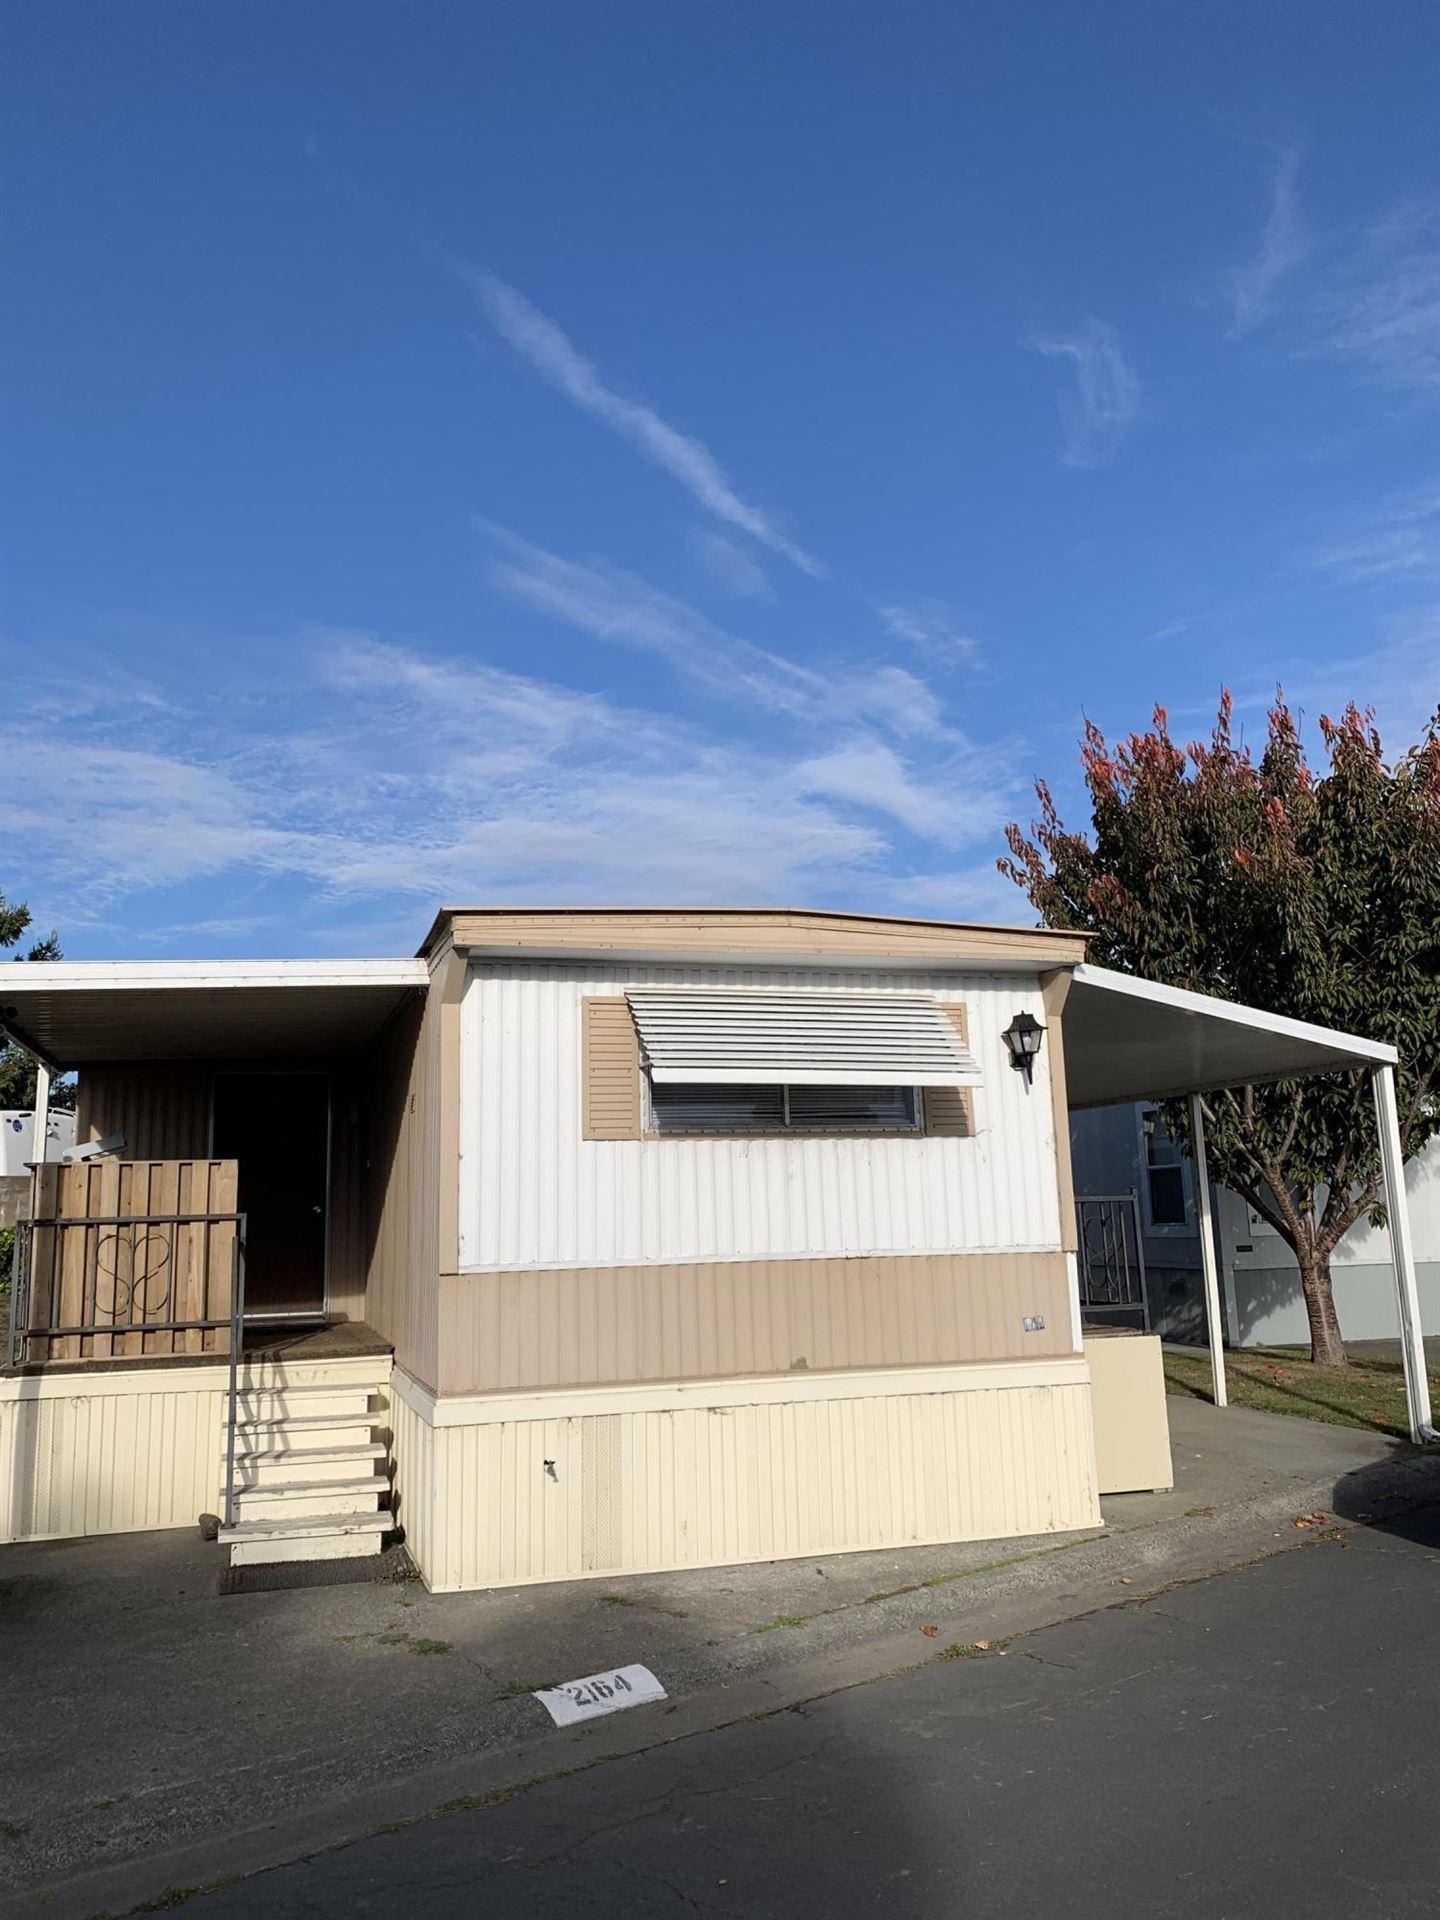 2164 Palomino Lane, Arcata, CA 95521 - #: 257793